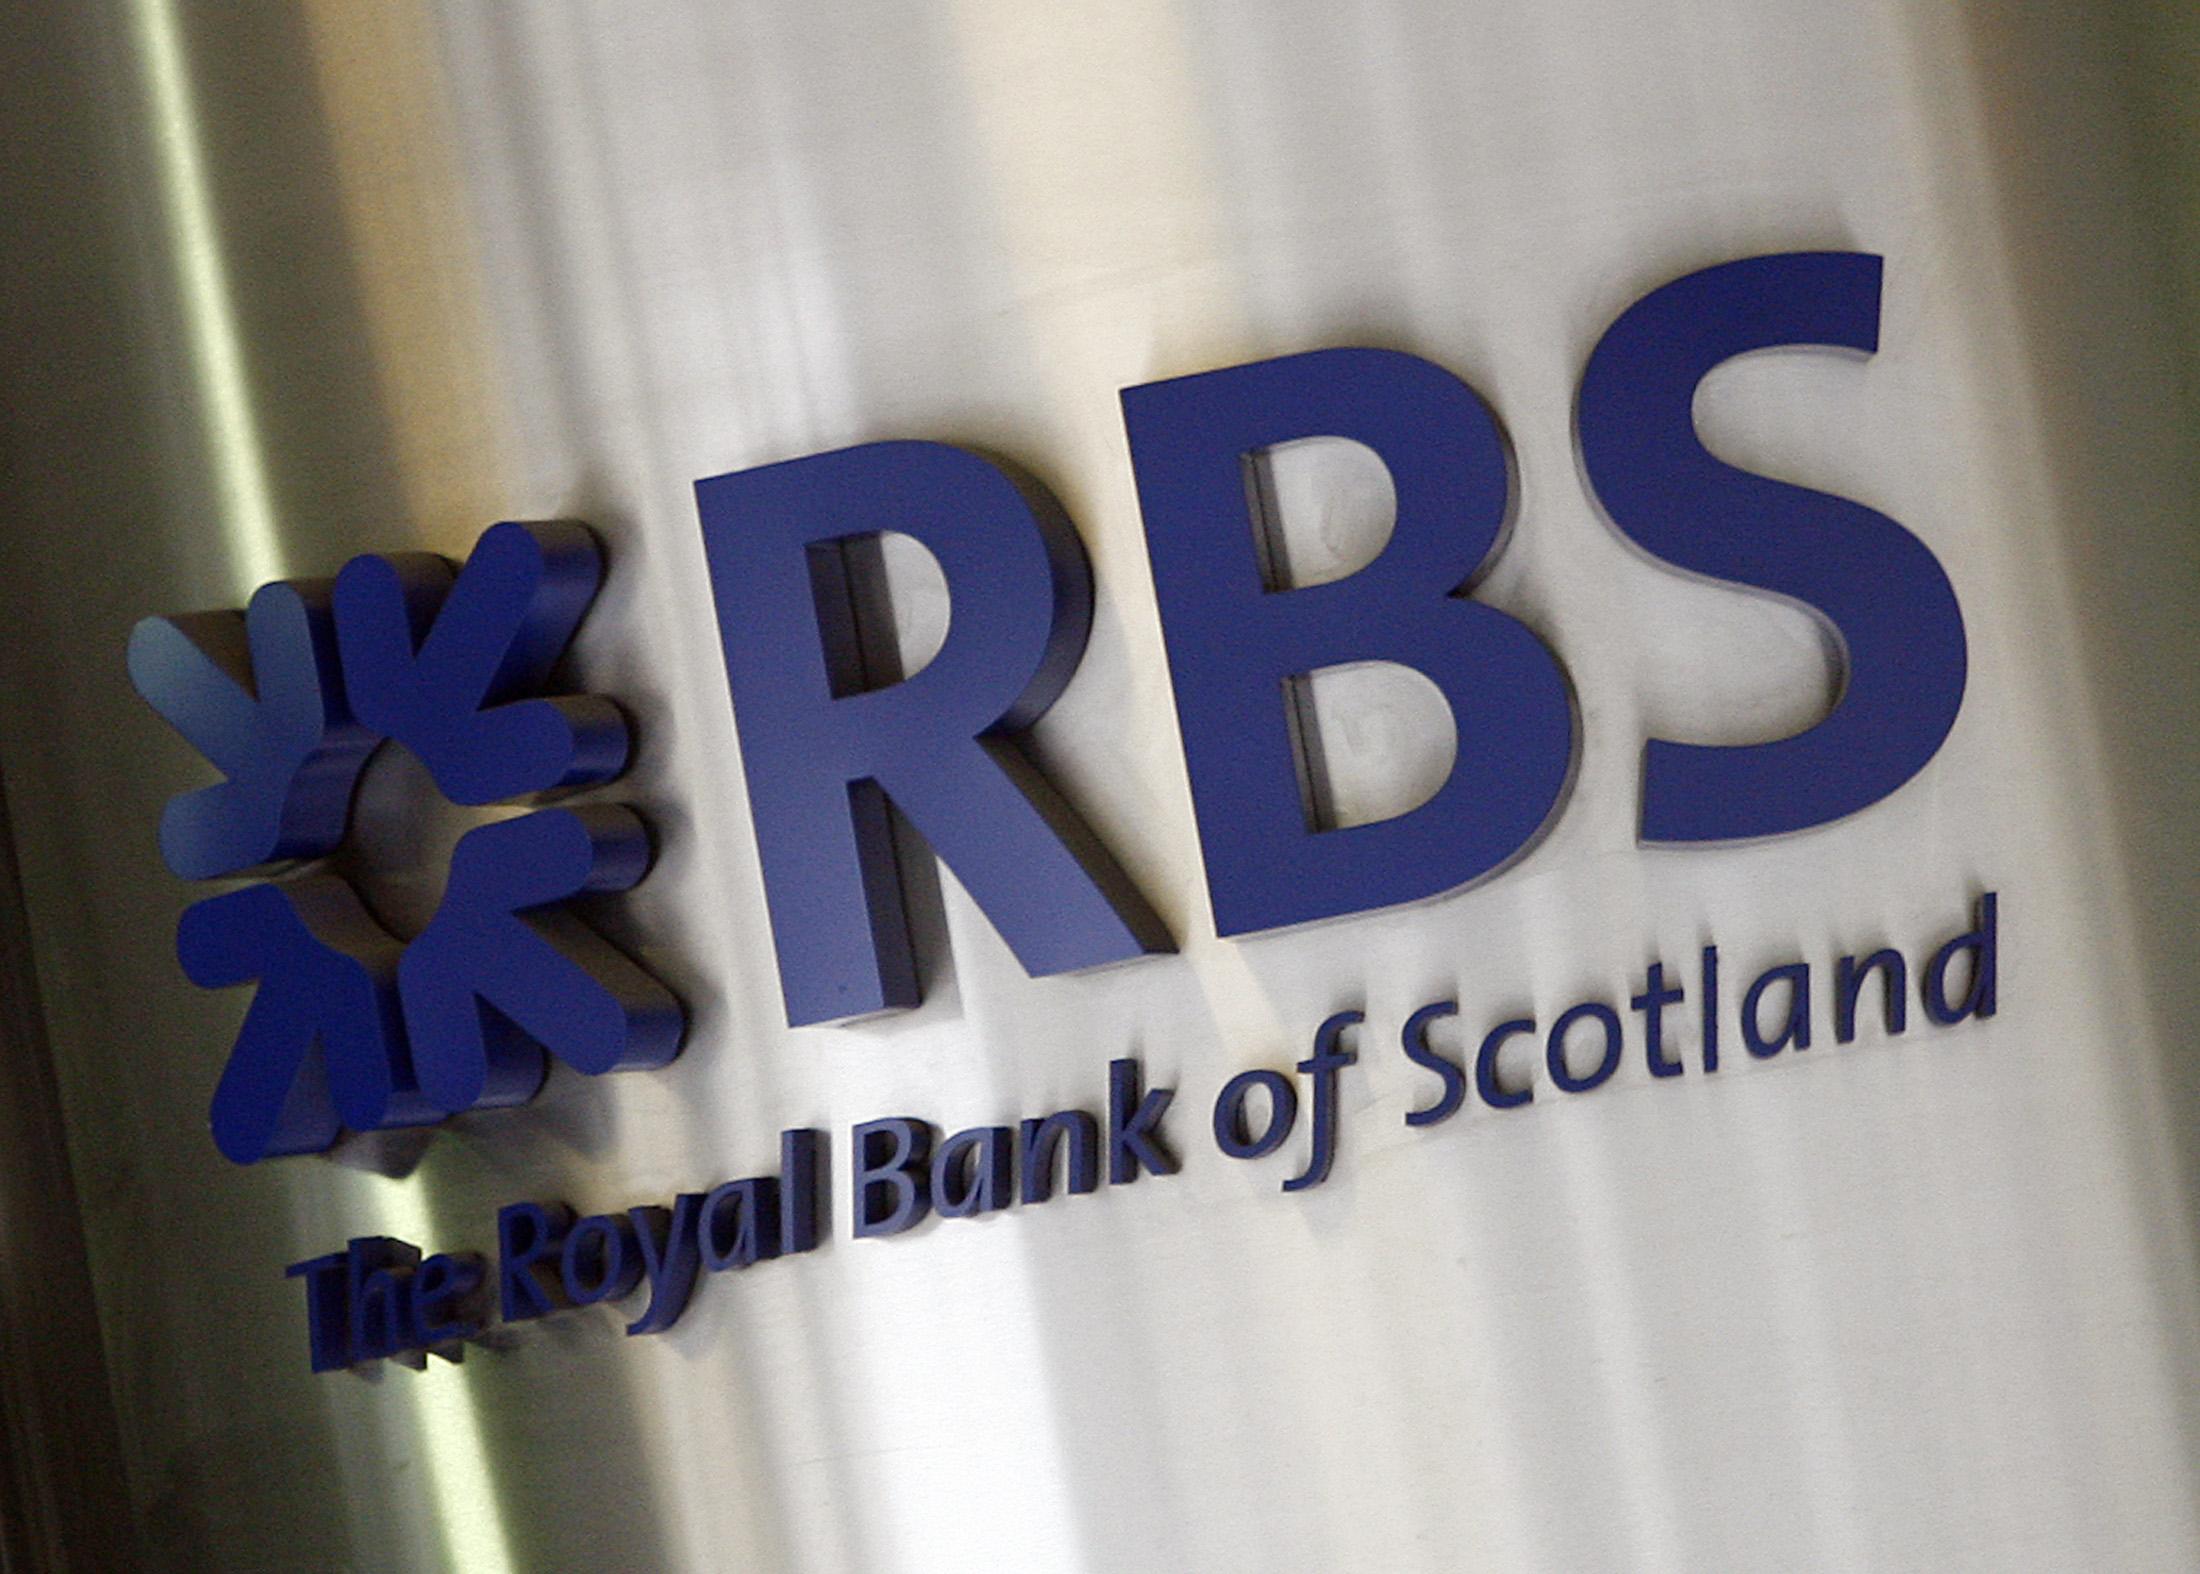 rbs-rbs-rating-reiterated-by-bnp-paribas.jpg